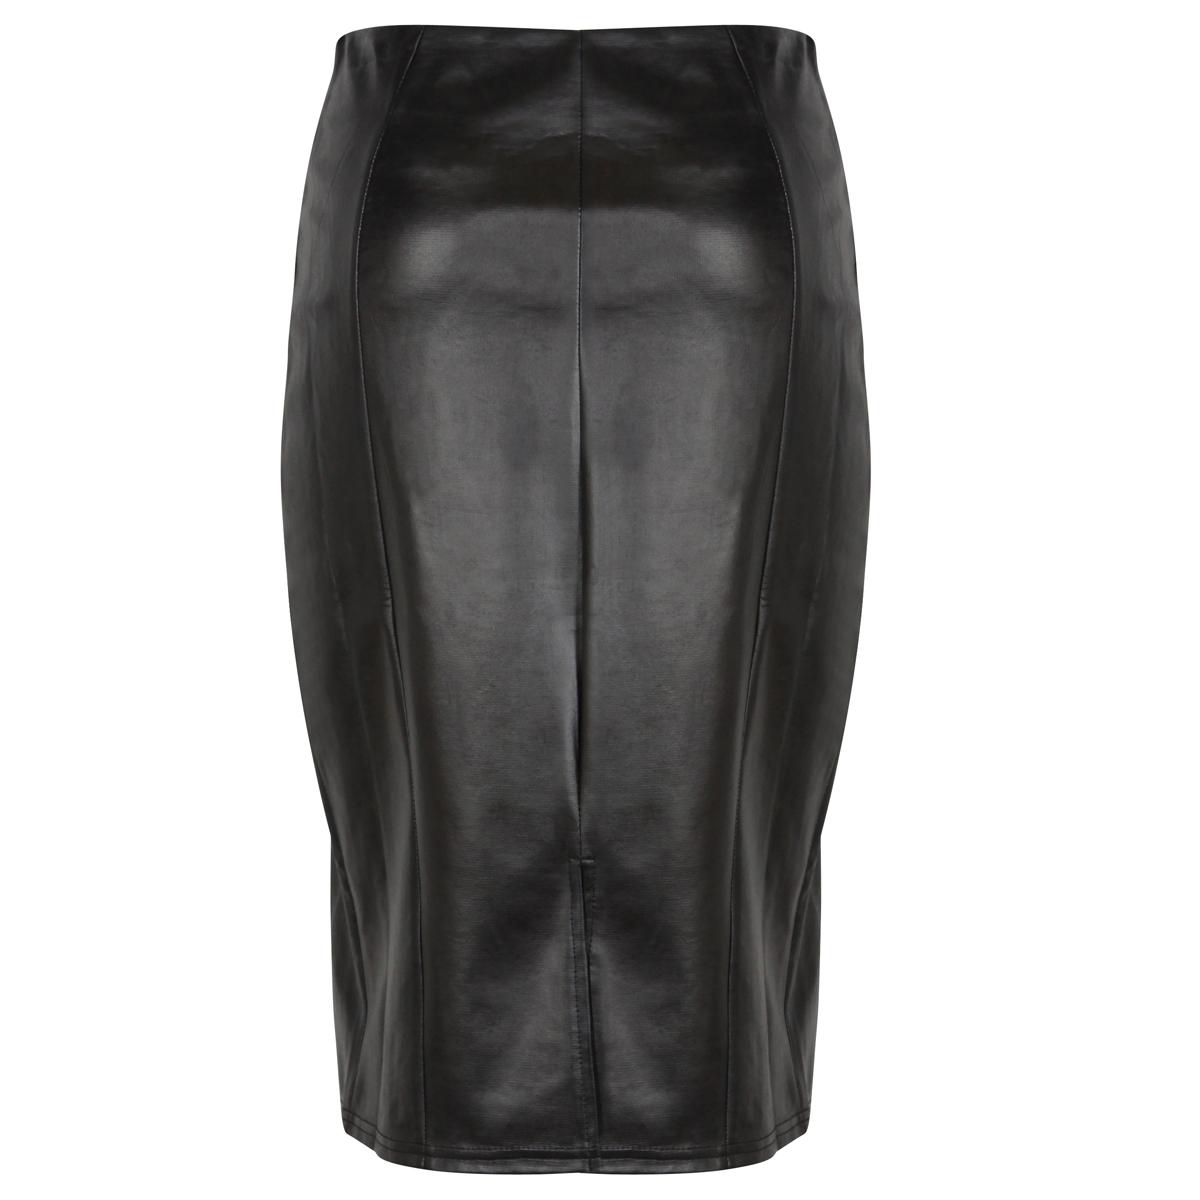 new womens black pu leather pleather pencil skirt midi